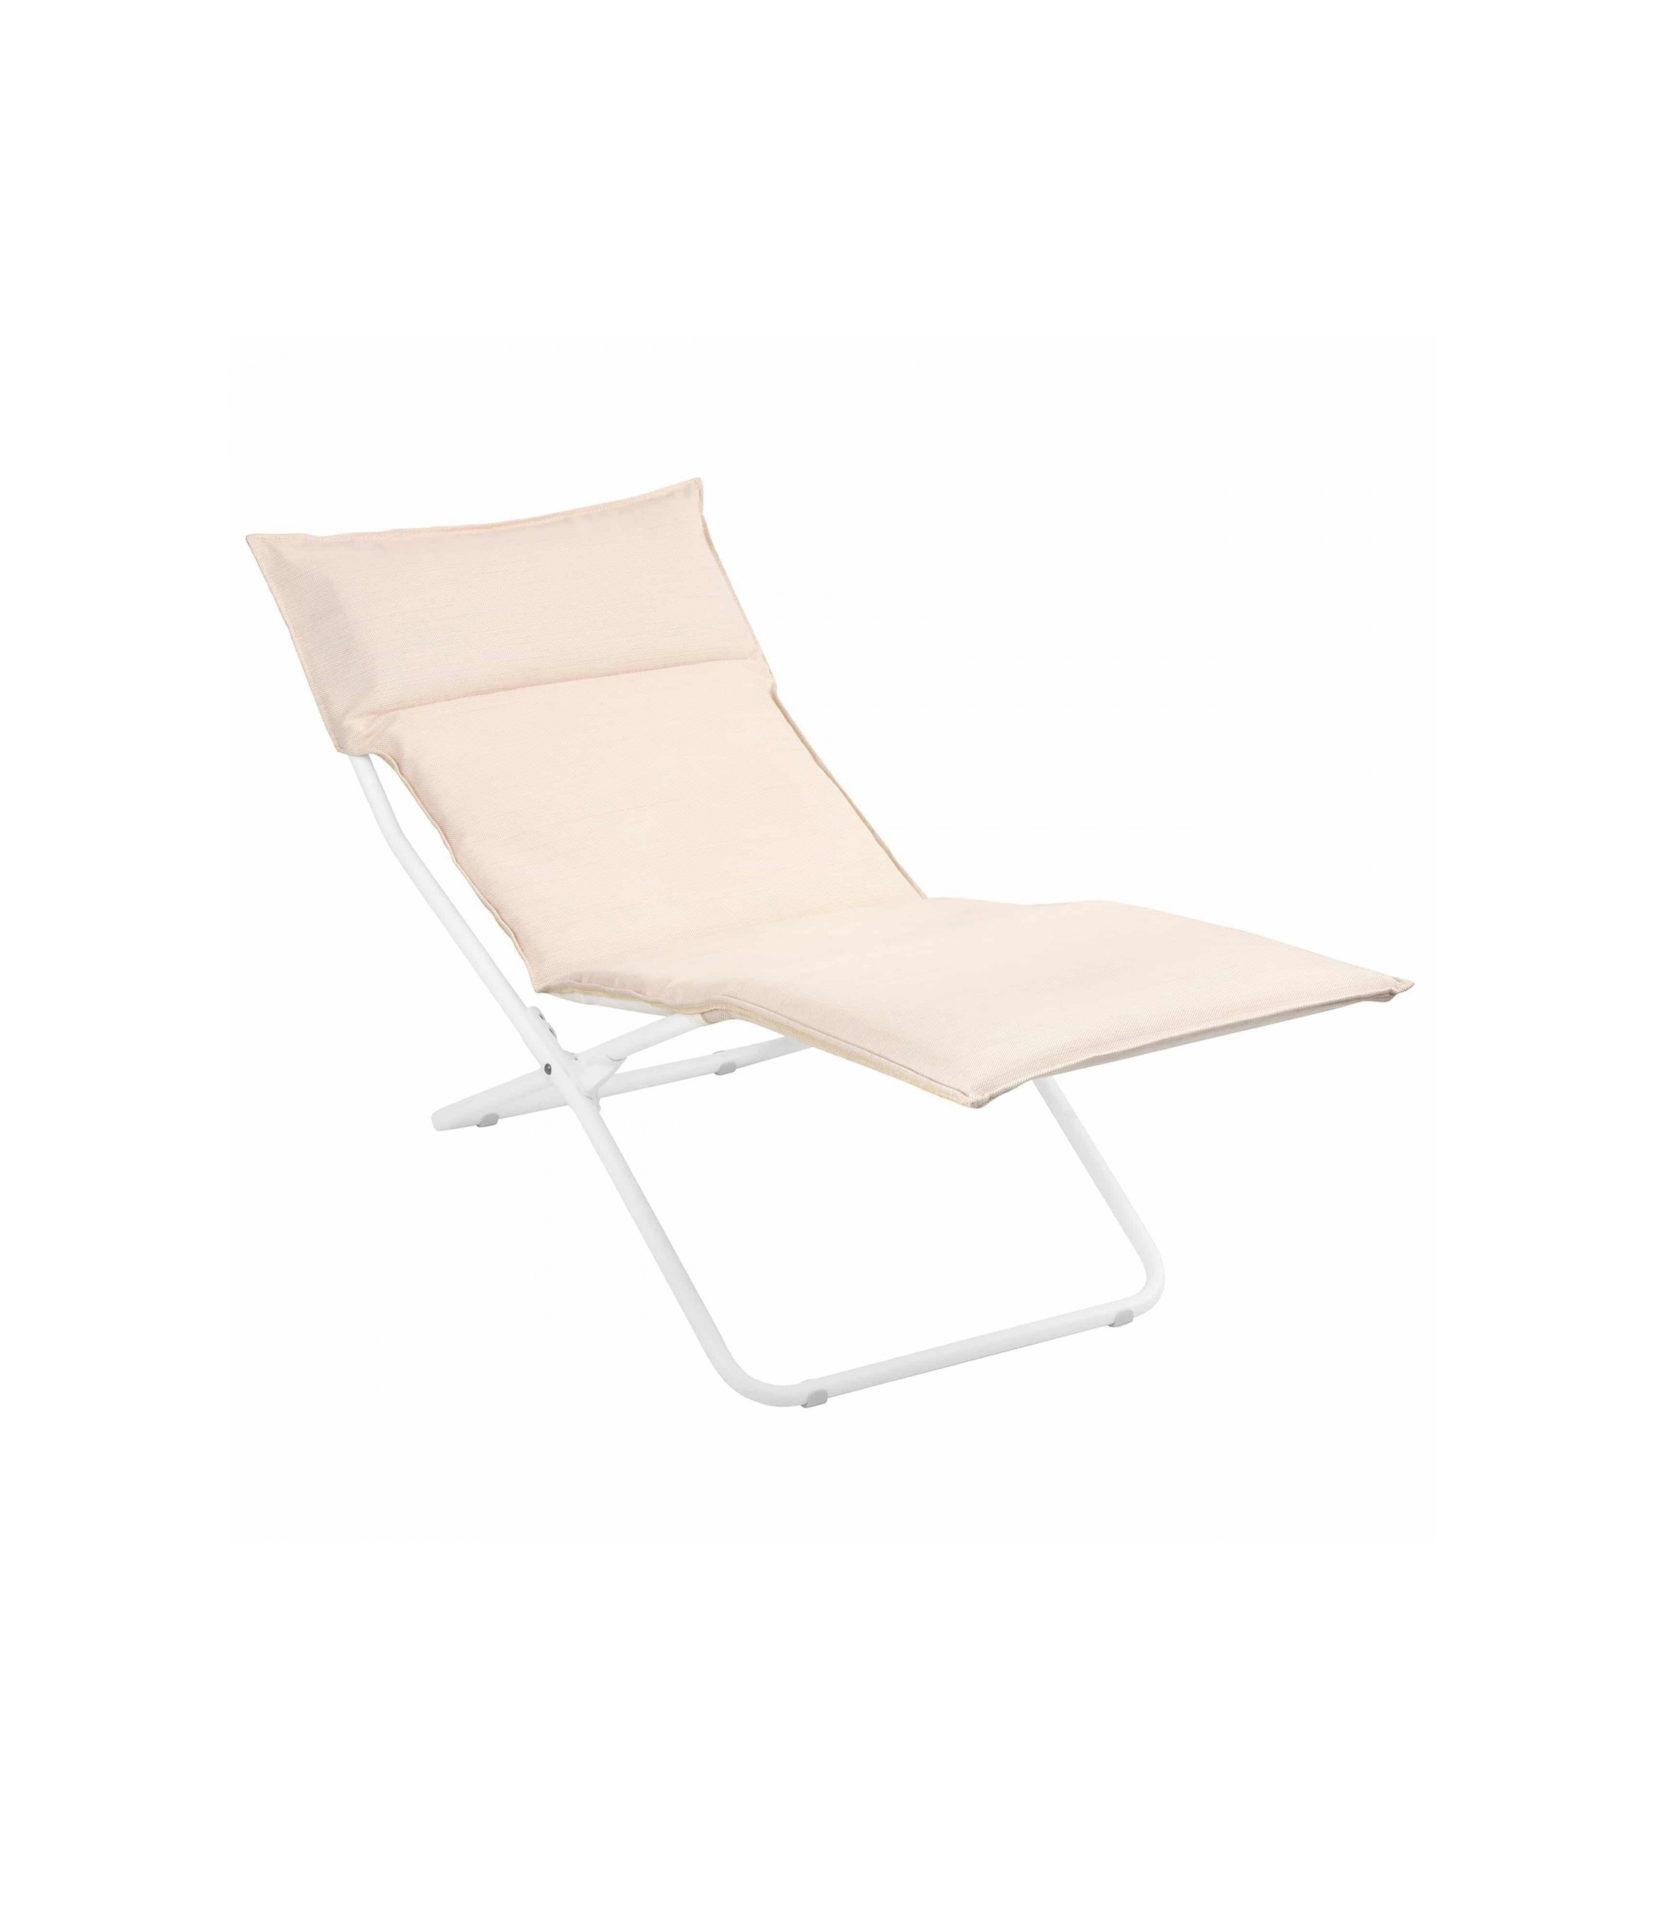 Chaise longue Bayanne